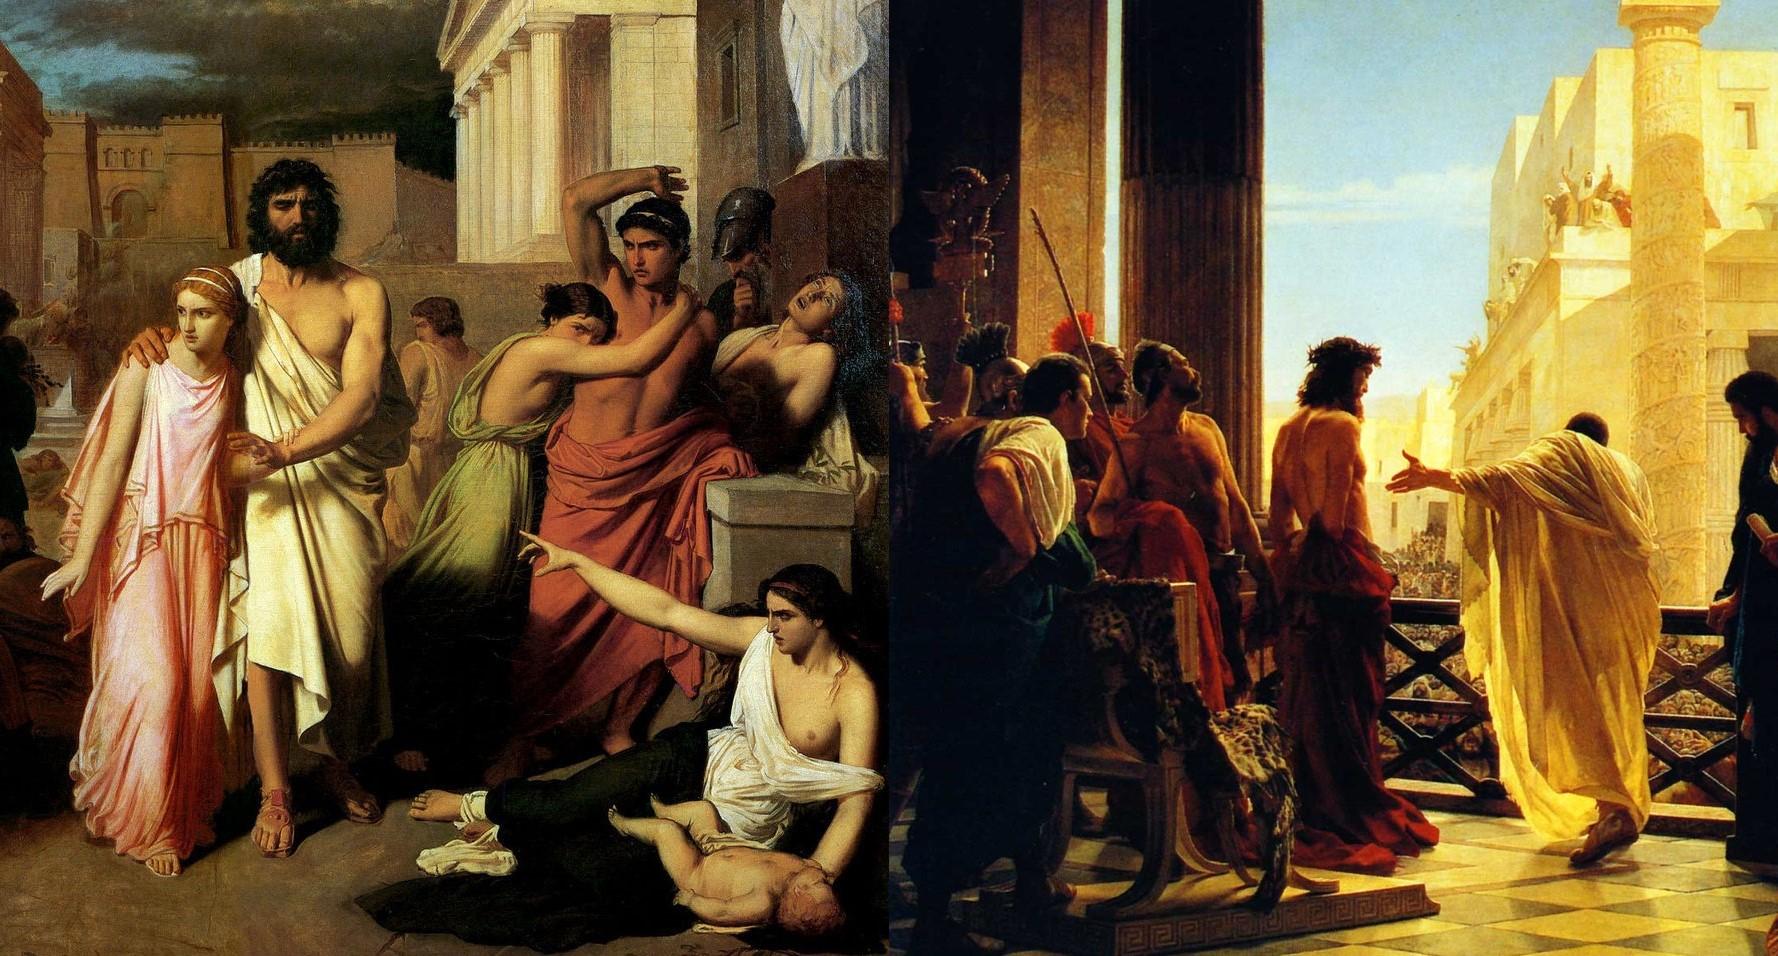 Oedipus of Myth vs Jesus of Gospel